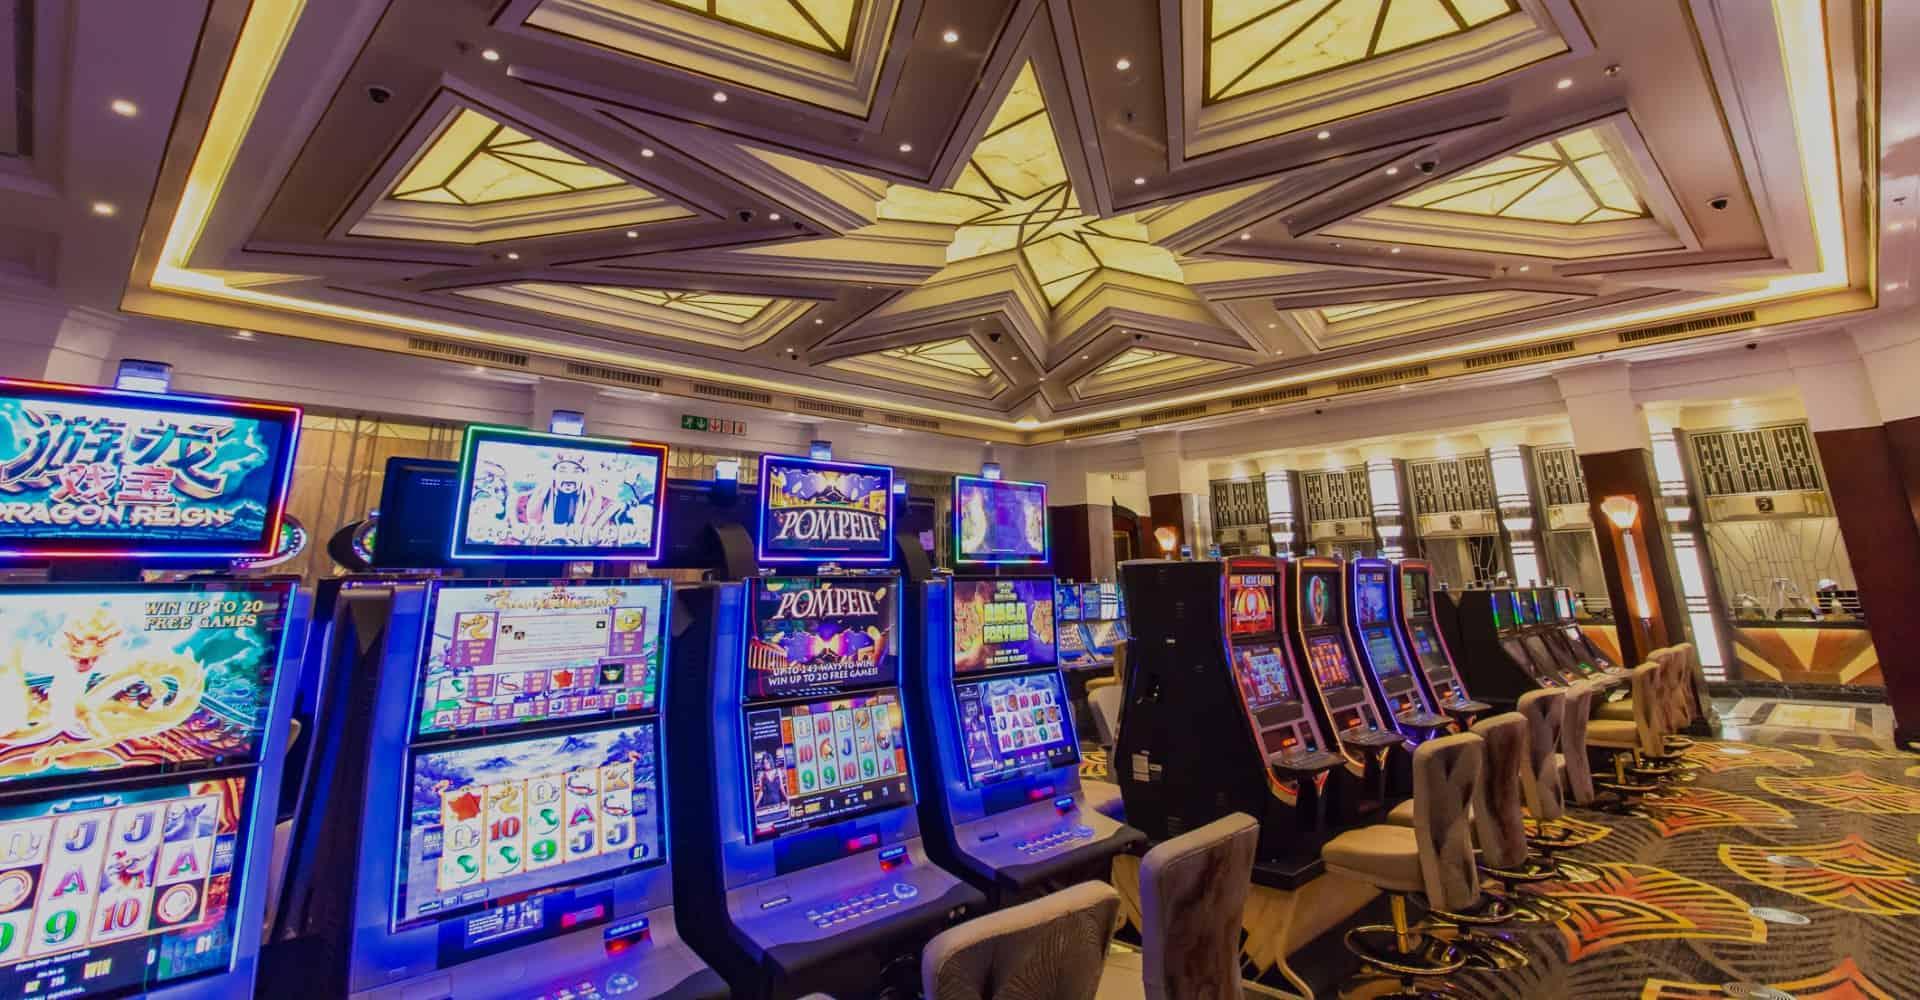 Salon Privé slots at Suncoast Casino landscape view